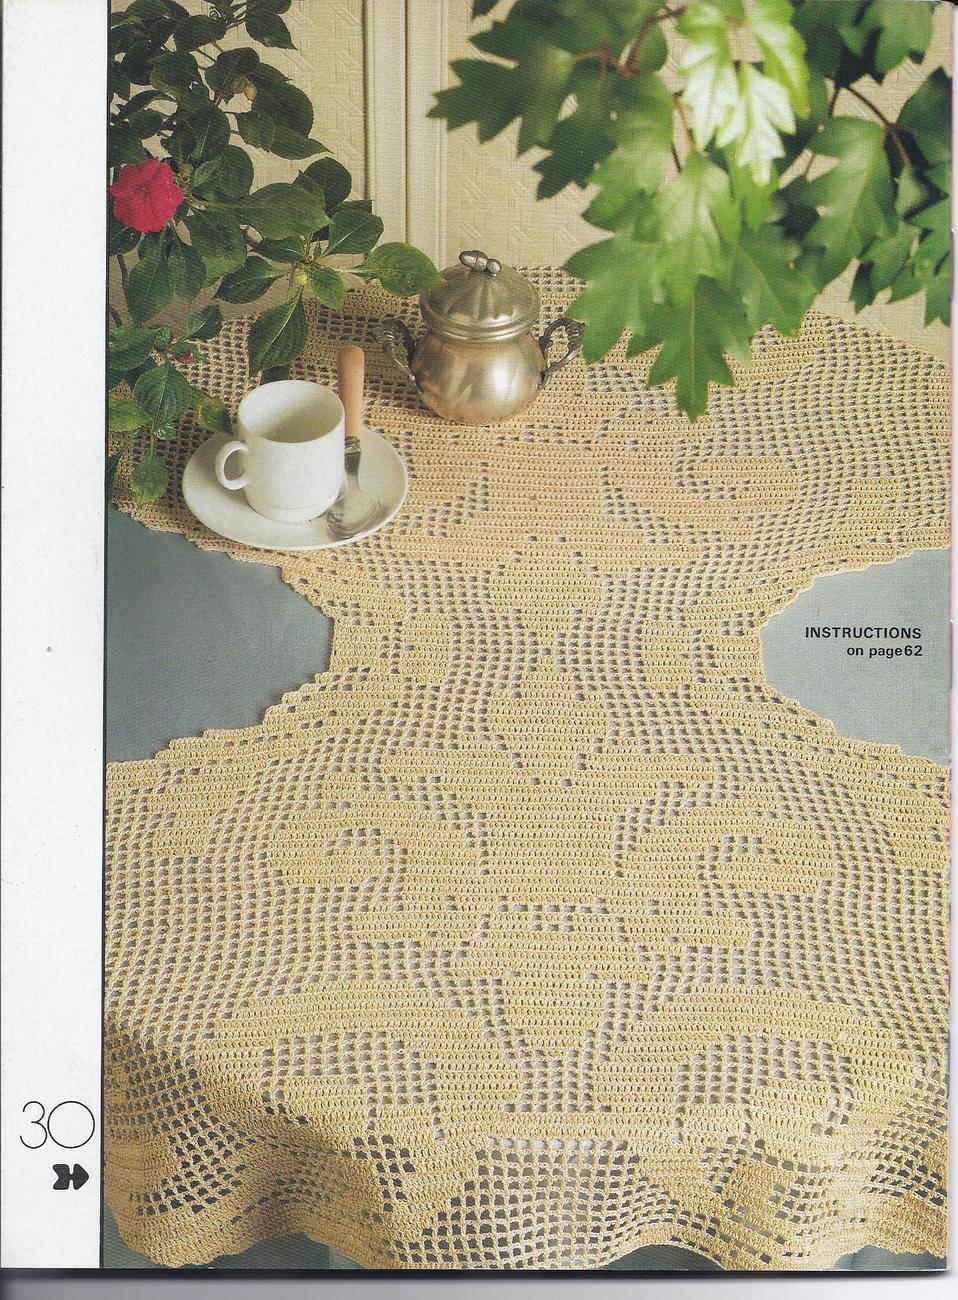 Decorative Crochet Pattern Magazine #14~~30 Patterns